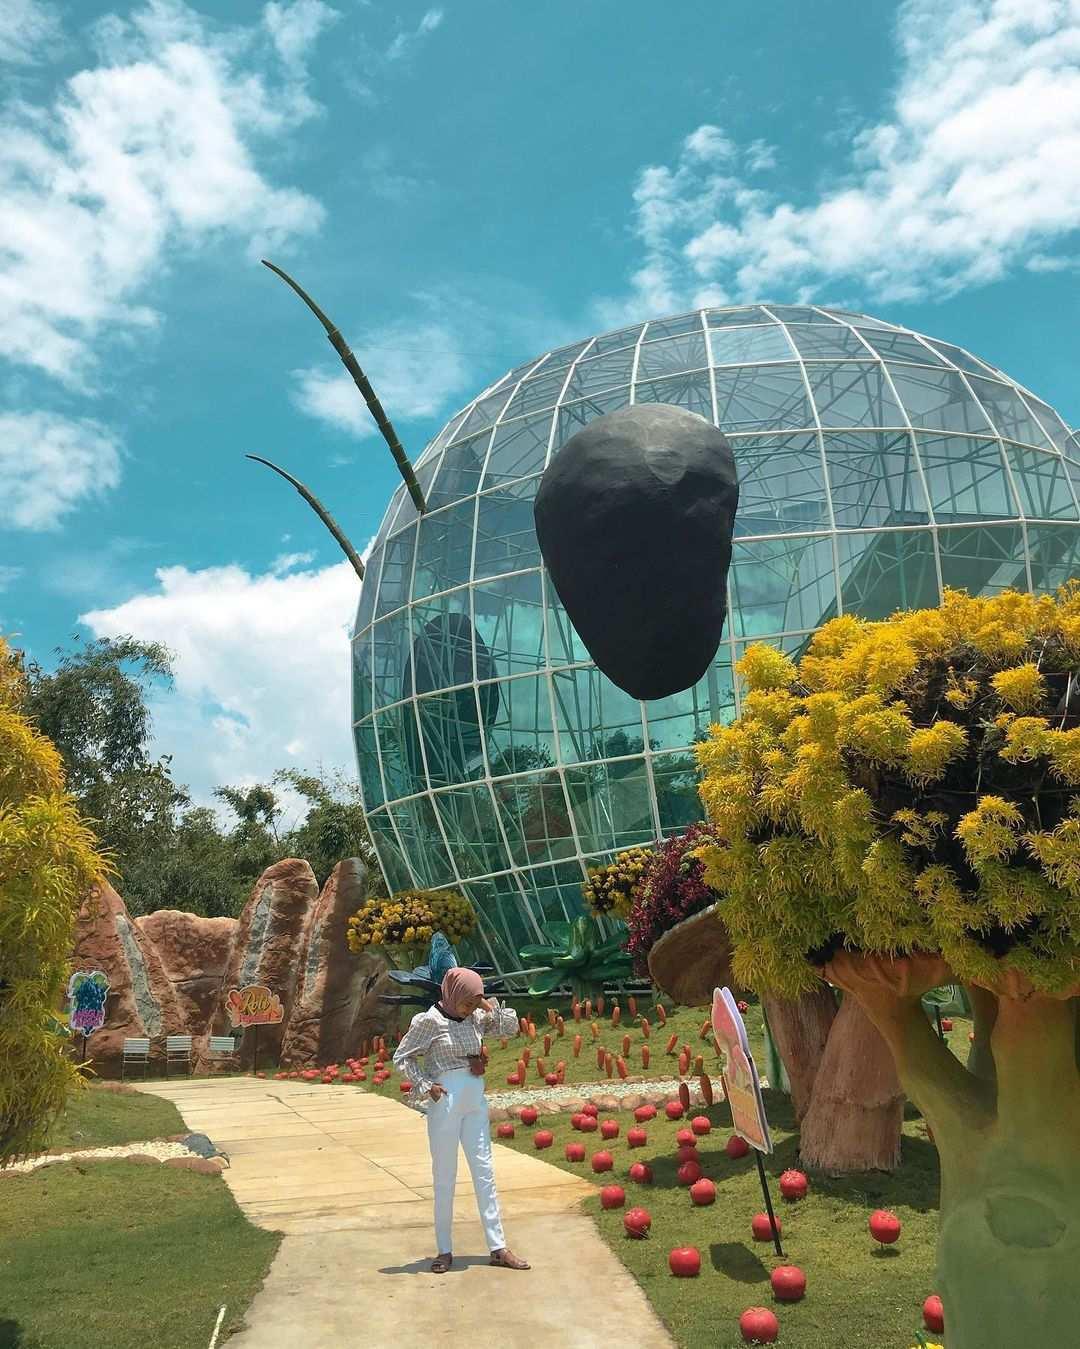 Berfoto di Batu Love Garden Malang Image From @kikiameliaagustin